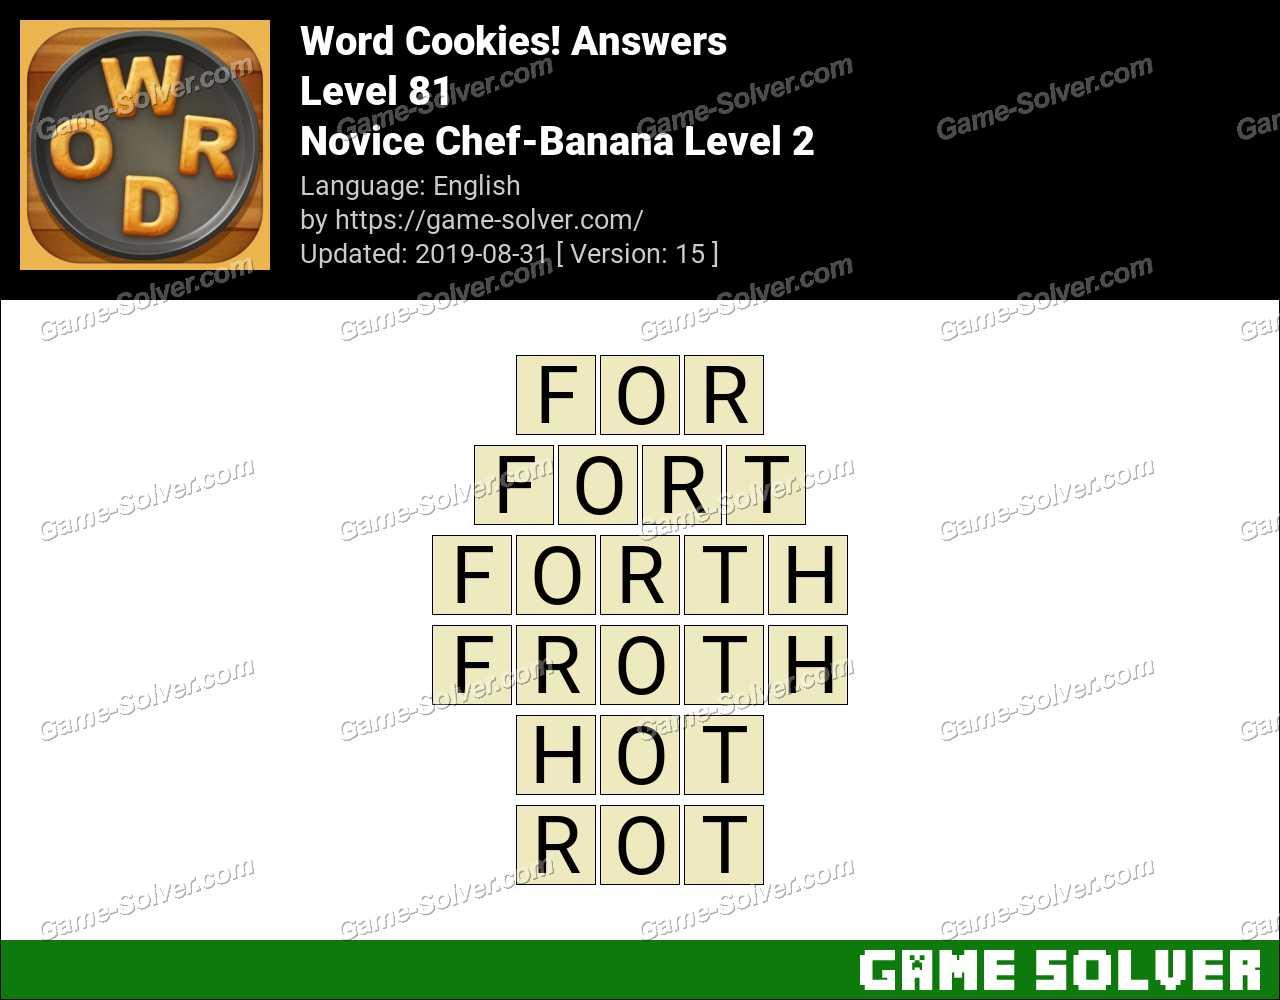 Word Cookies Novice Chef-Banana Level 2 Answers